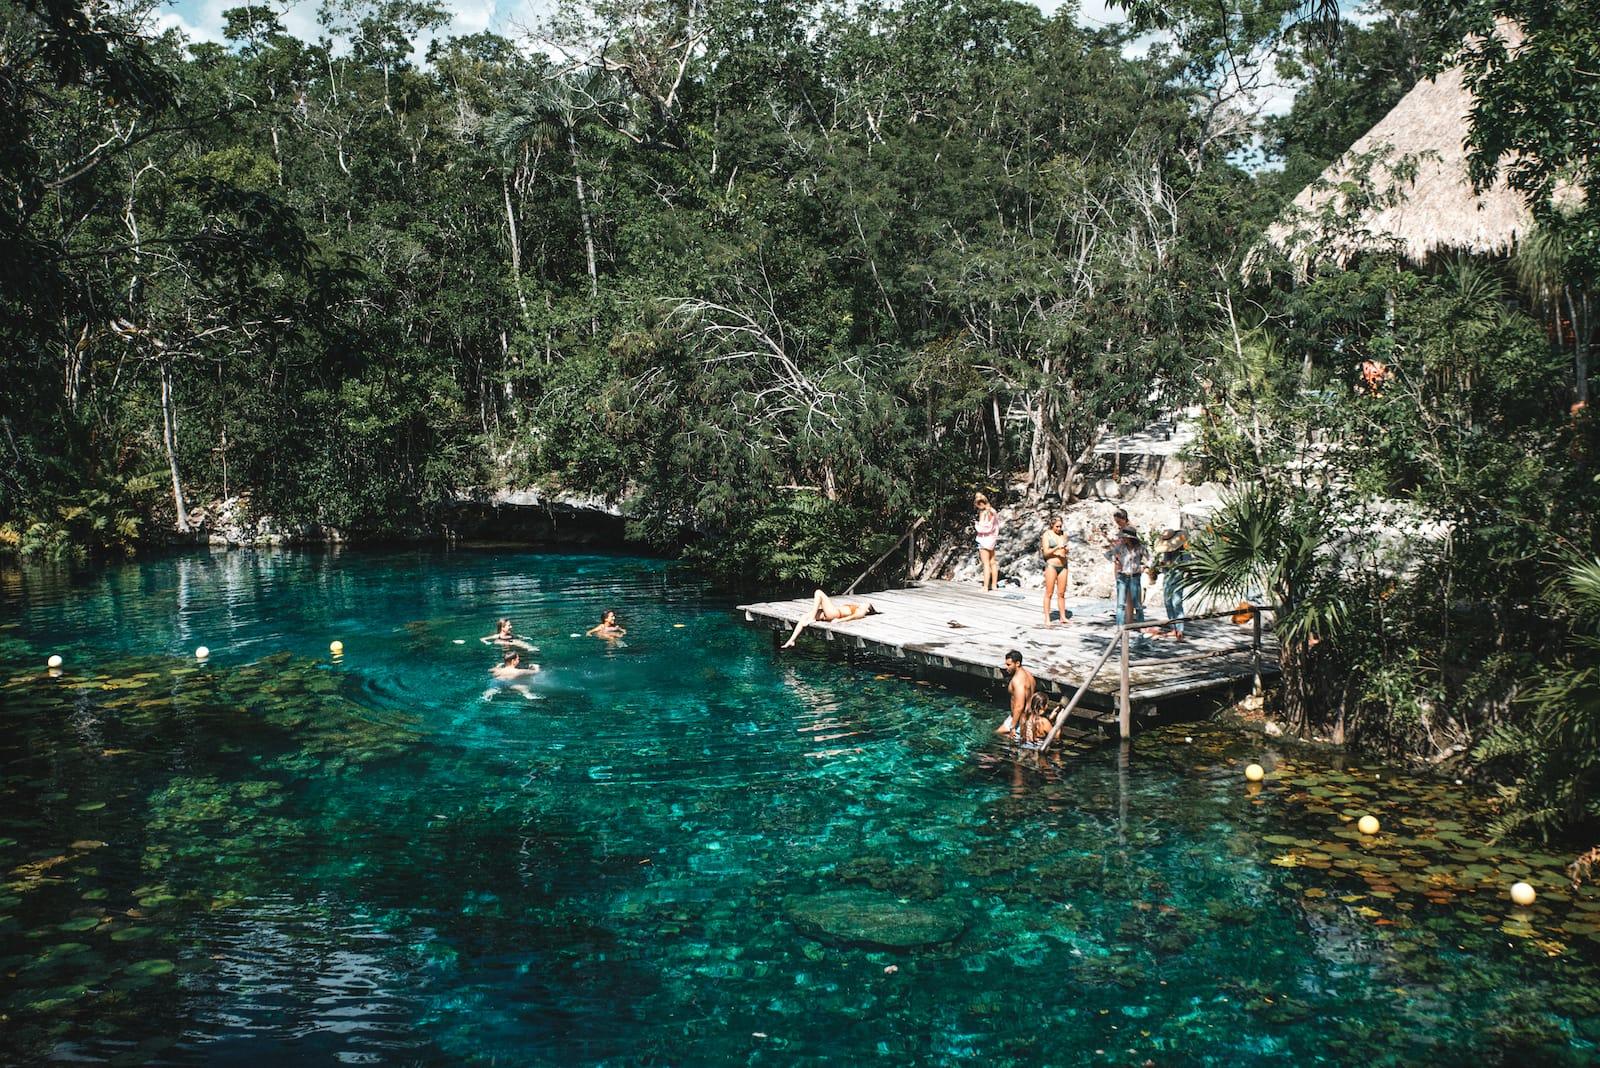 swimming in lagoon adventure all inclusive resort mexico romantic vacation